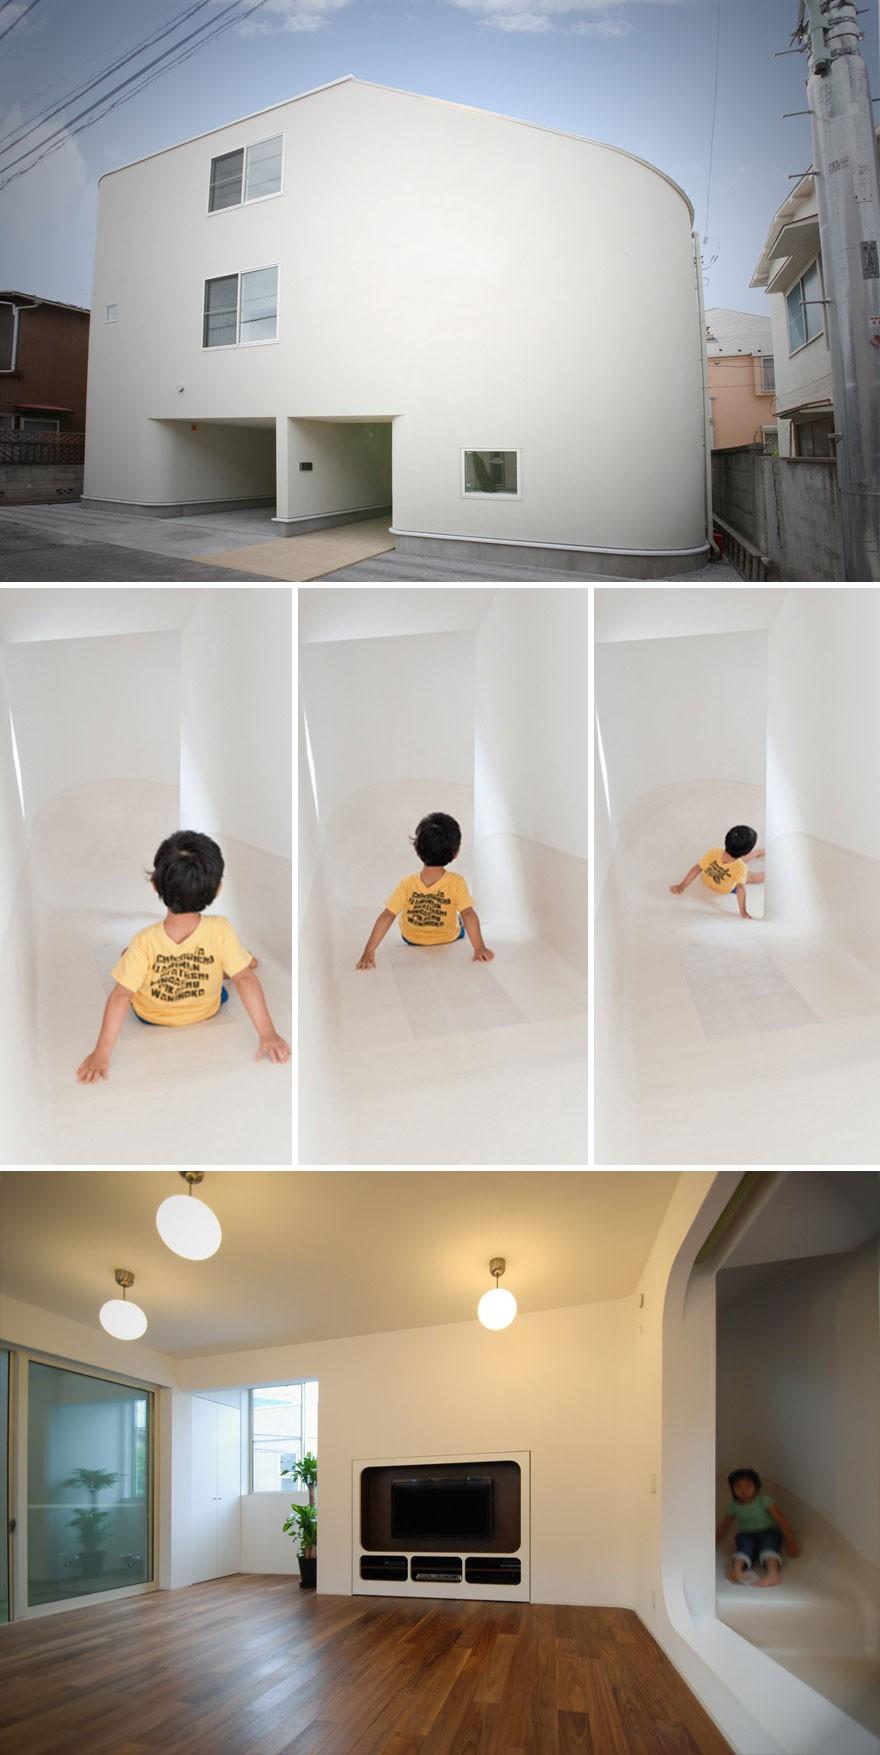 (Foto: Reprodução/Studio LEVEL Architects)